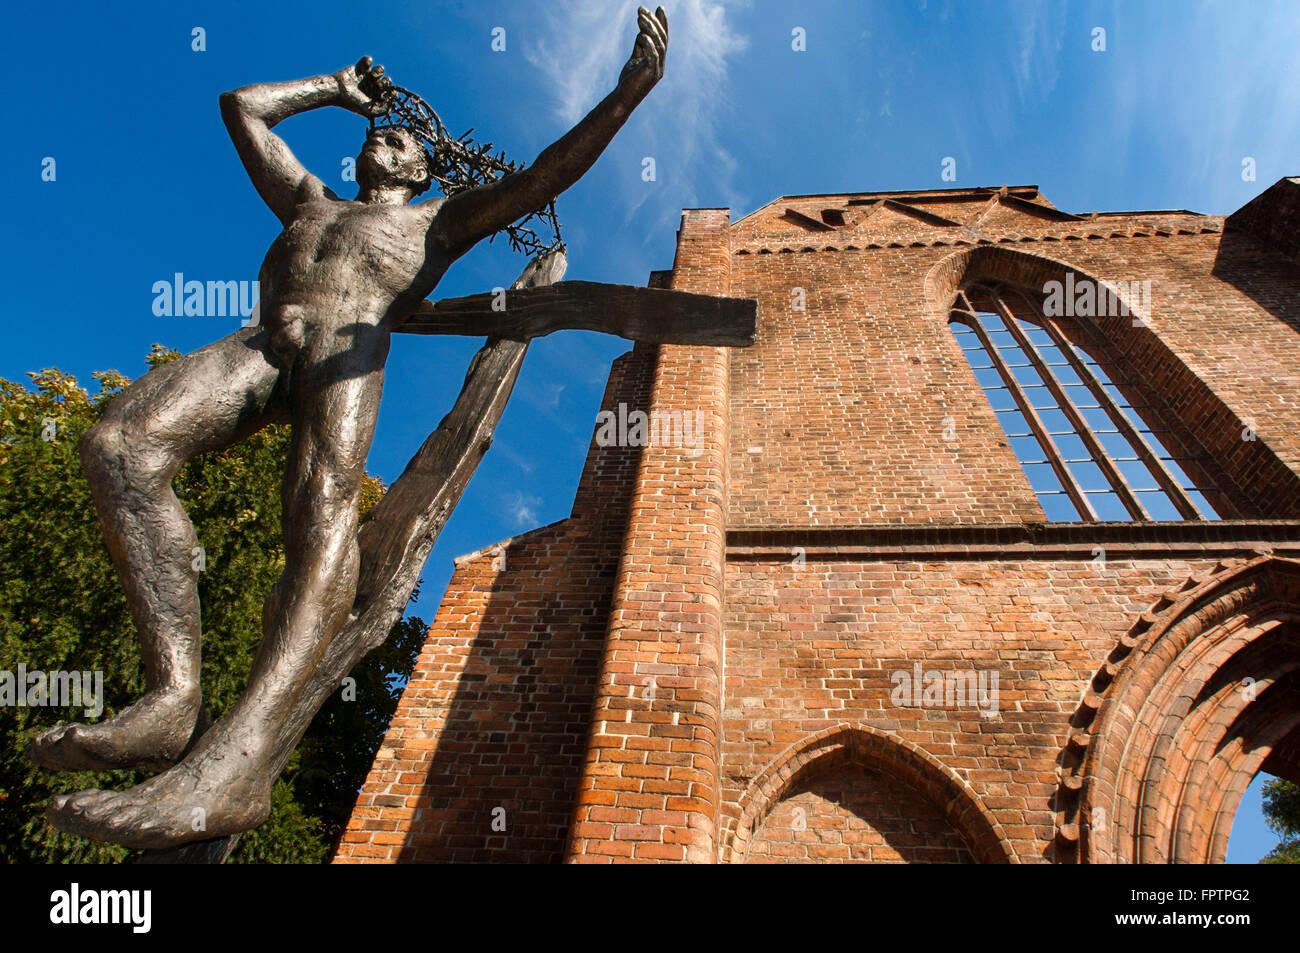 Franziskaner Klosterkirche (Franciscan Friary Church) ruin, Berlin, Germany. In West Berlin, near Bahnhof Zoo, is - Stock Image